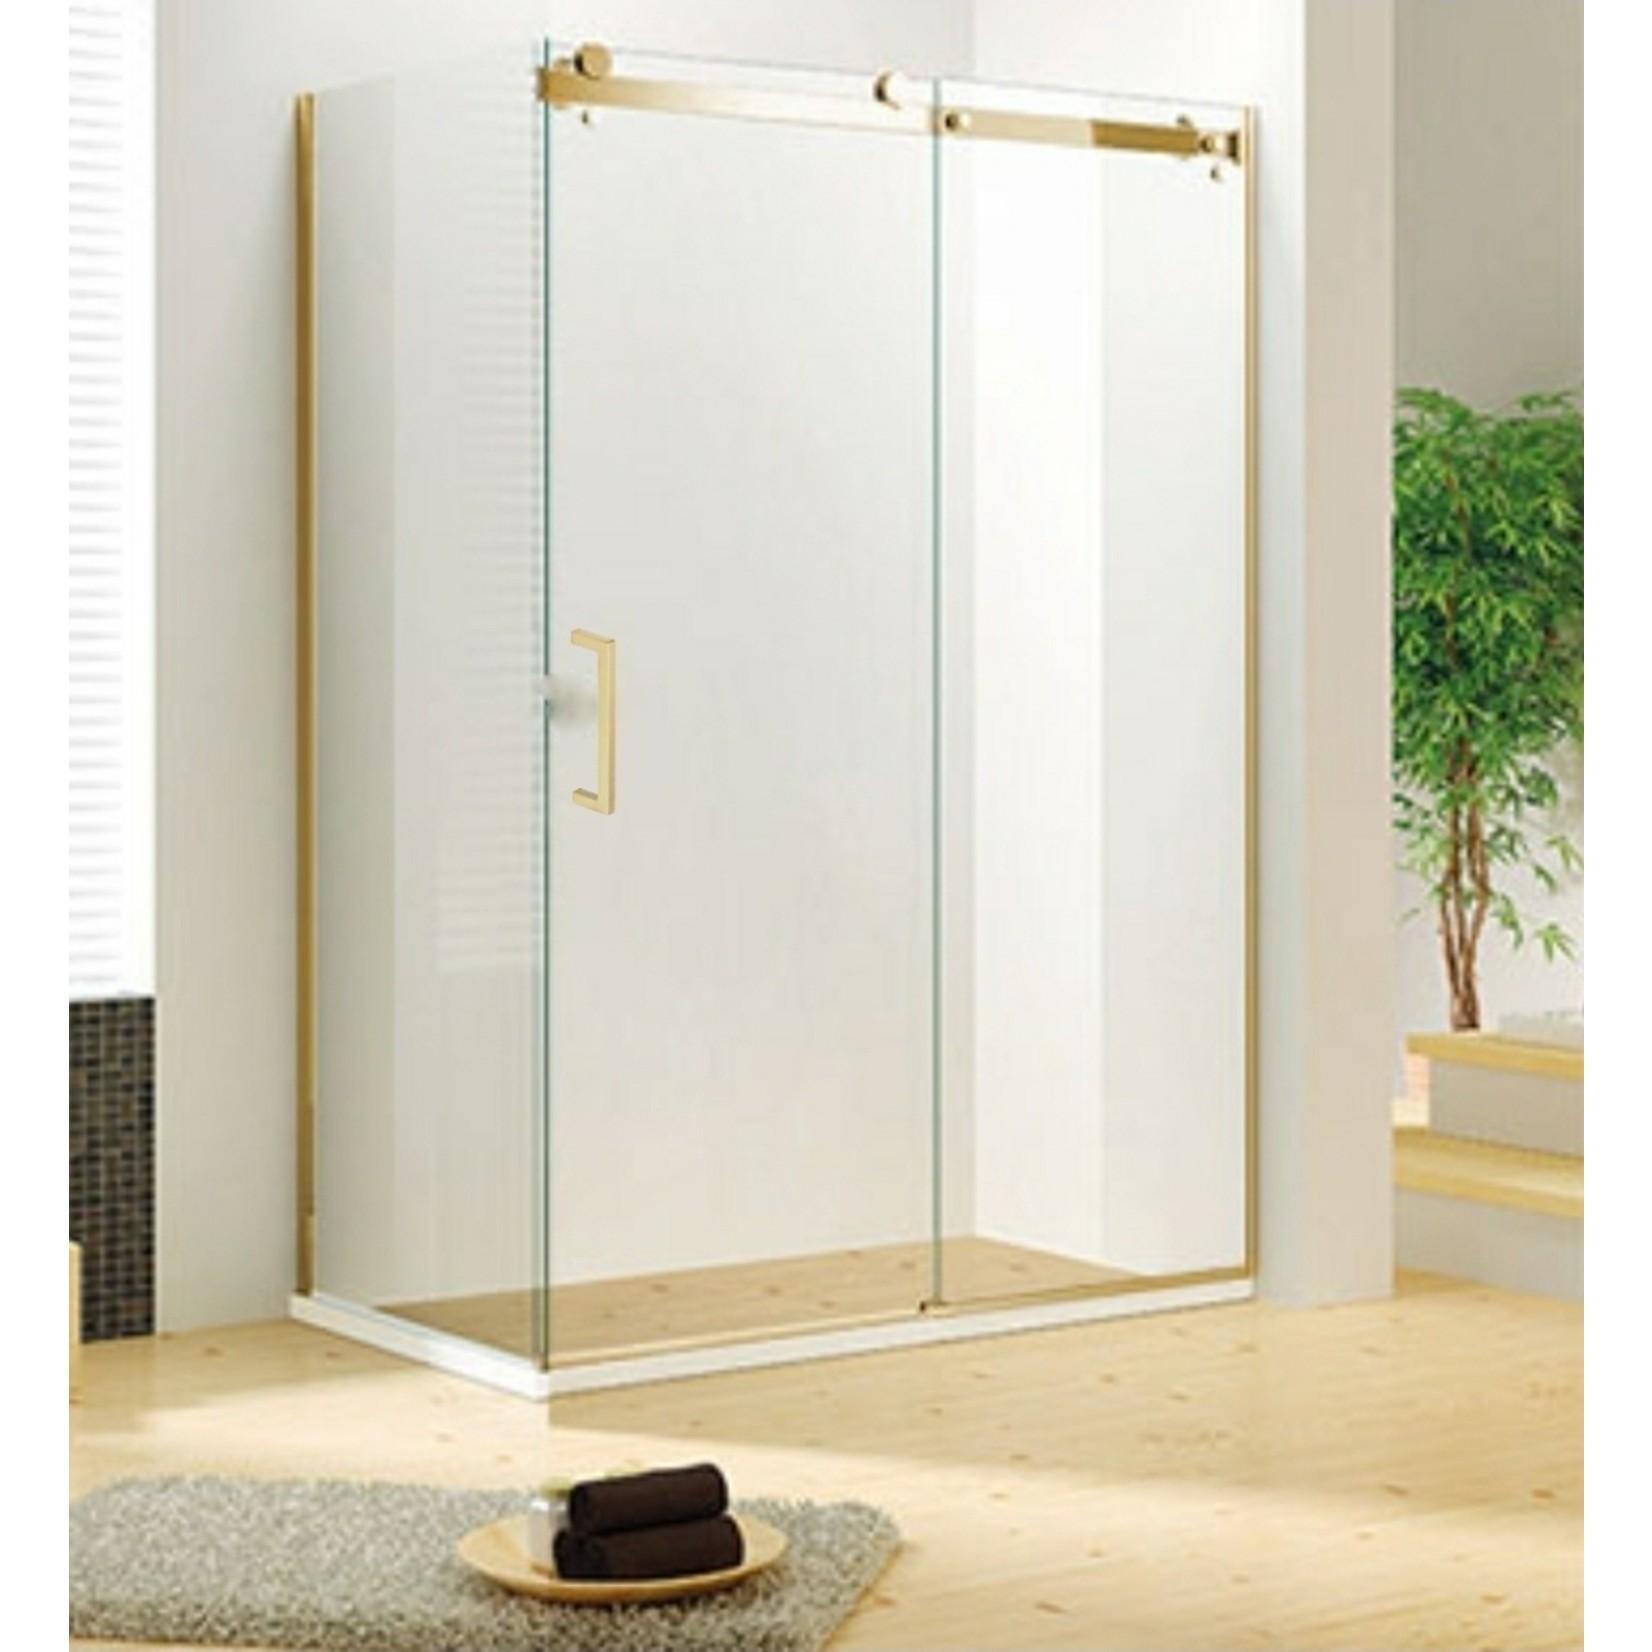 Reversible shower set 32x60 Brushed gold Quartz series Jade bath